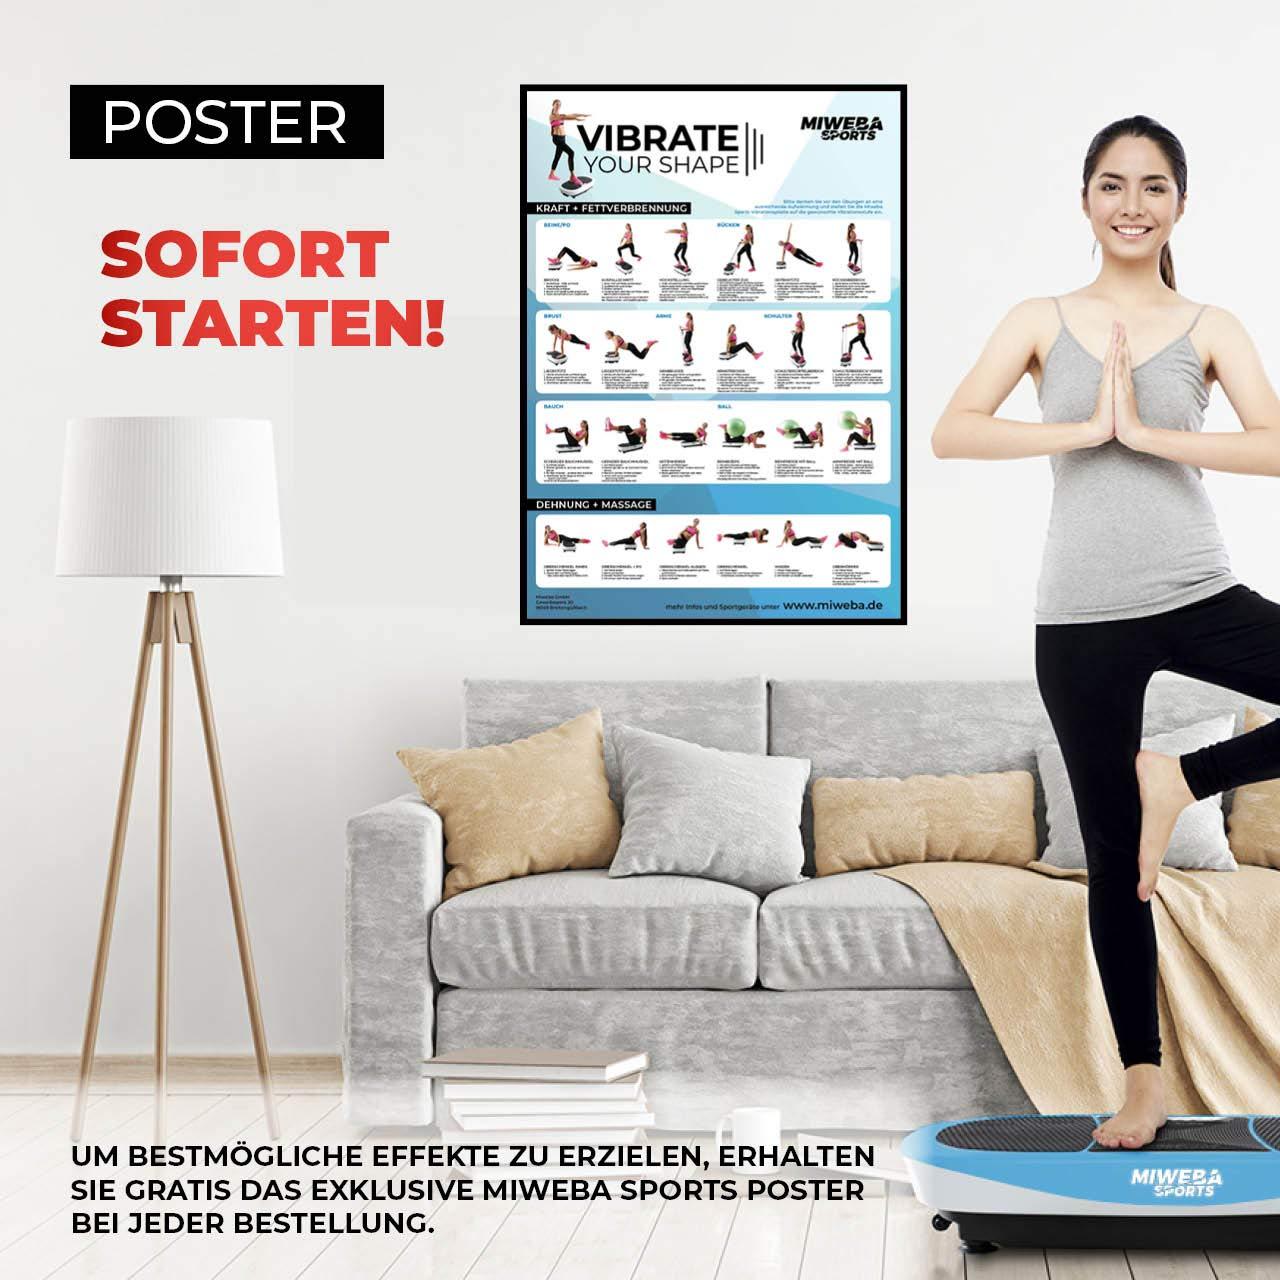 Vertikal 400 Watt Oszillierend Miweba Sports Fitness 3D Vibrationsplatte MV200-3 Vibrationsmodi Horizontal